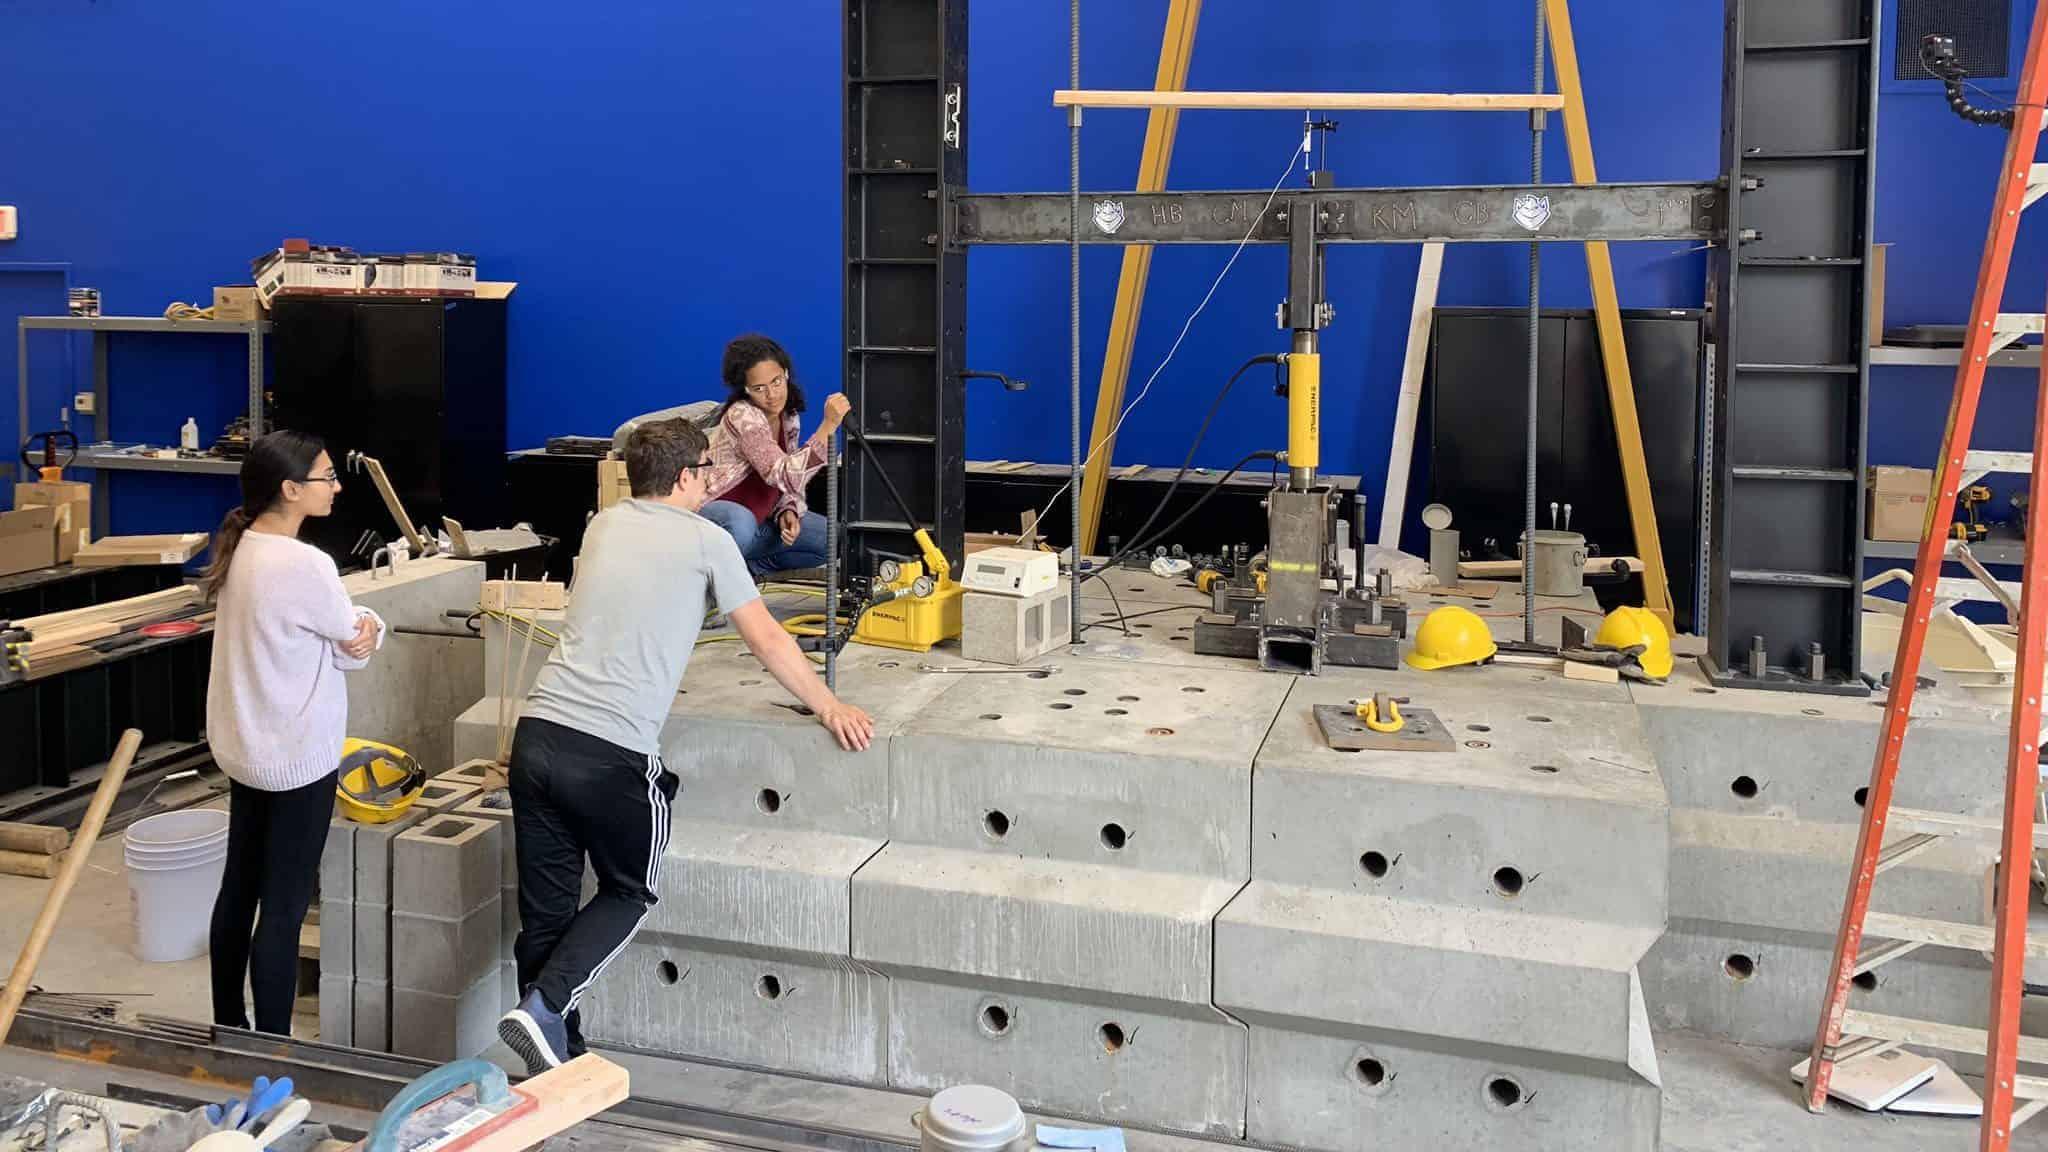 St. Louis University Structural Engineering Lab Blocks by Wieser Concrete